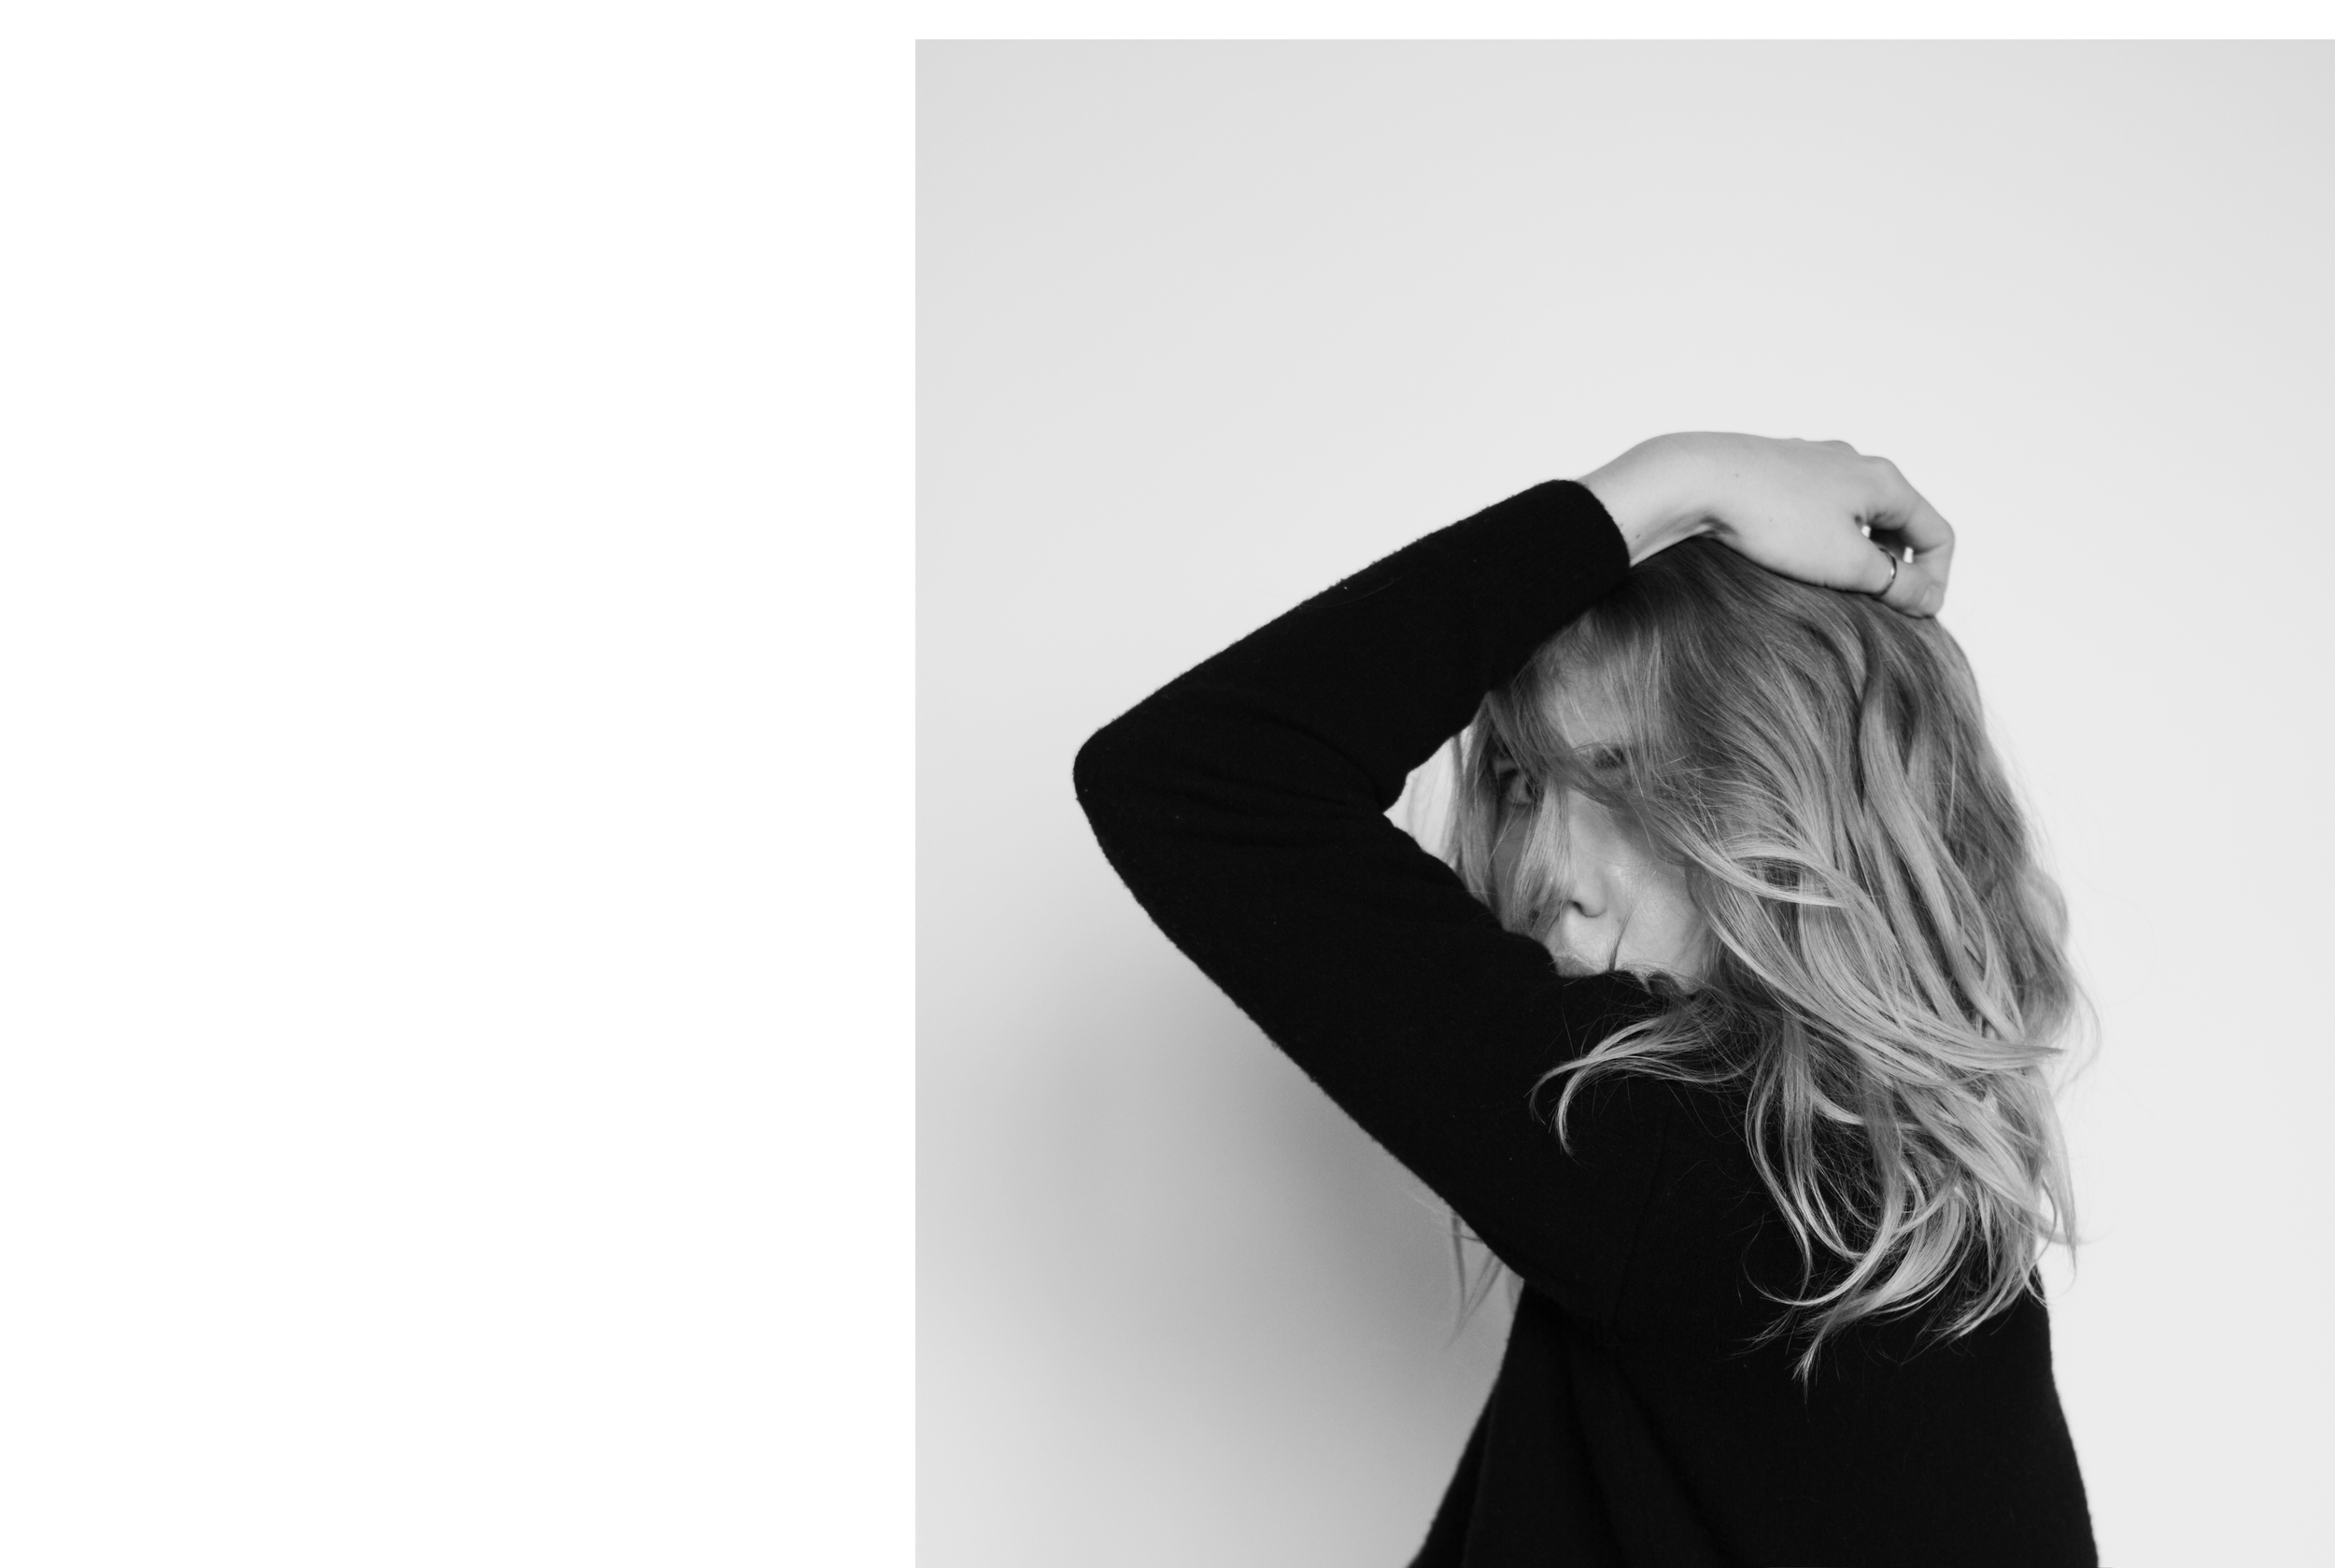 TaylrAnne-The-Sept-Cashmere-Minimal-4